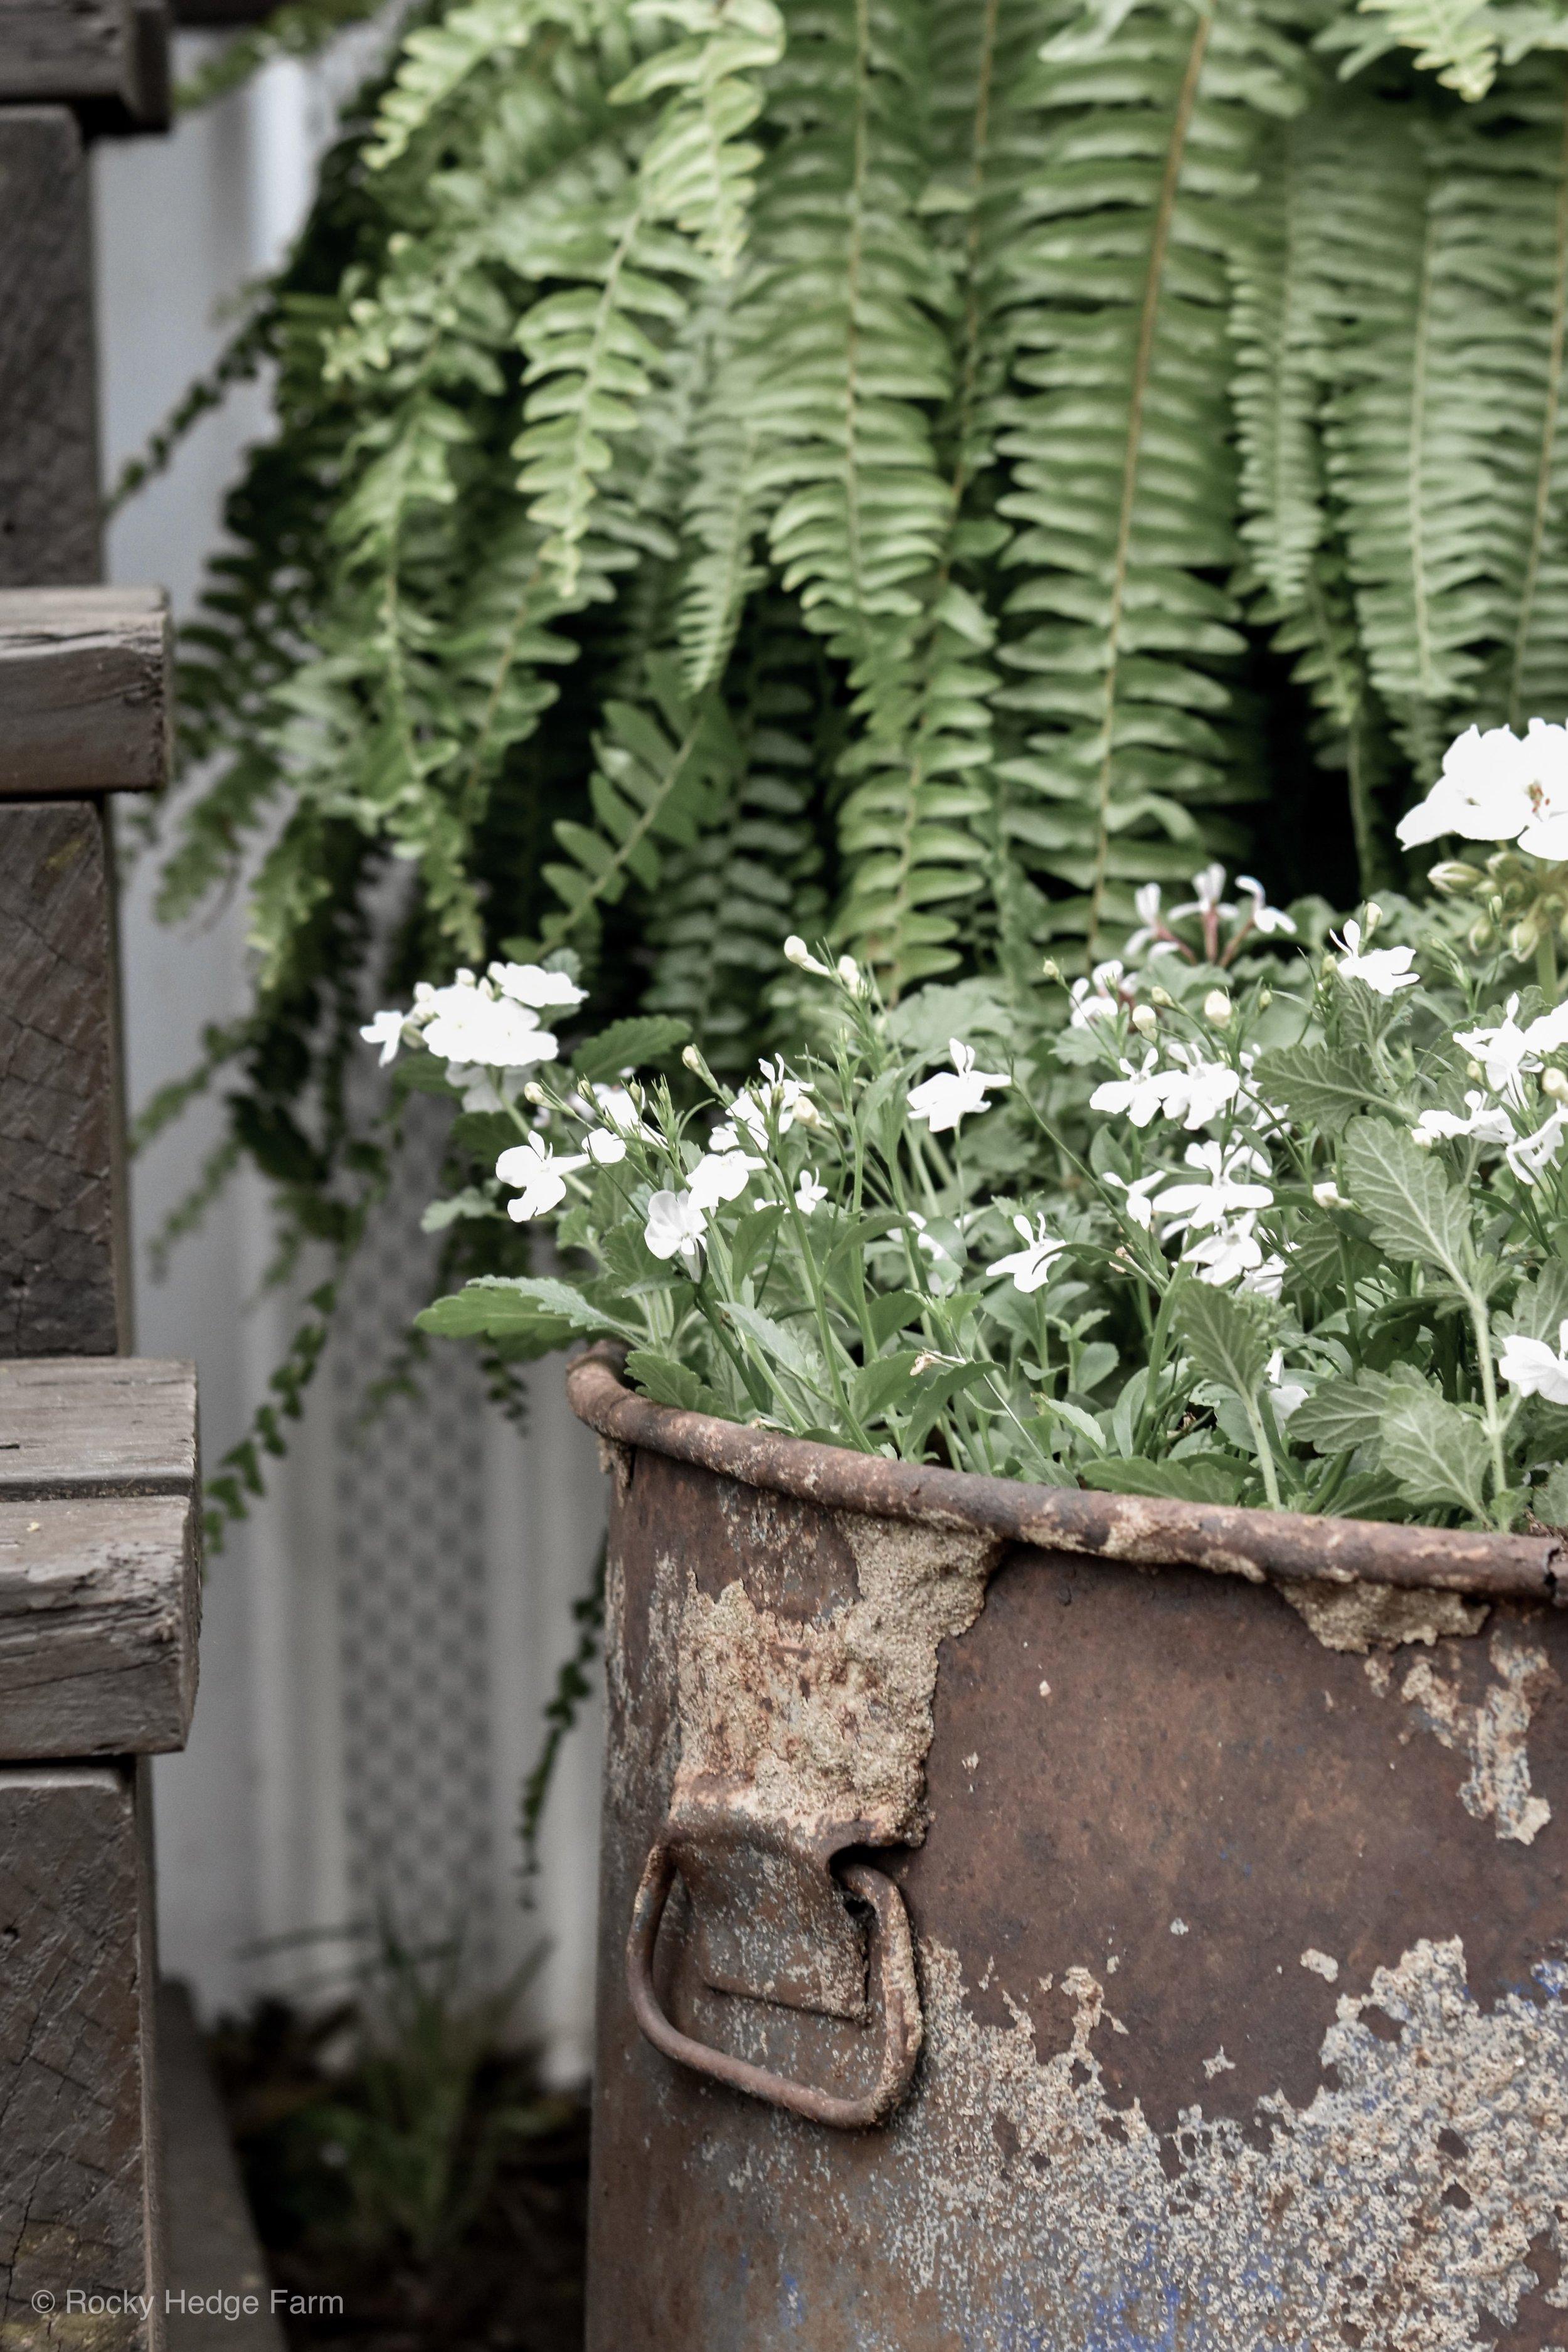 Rustic Garden Planter | Rocky Hedge Farm